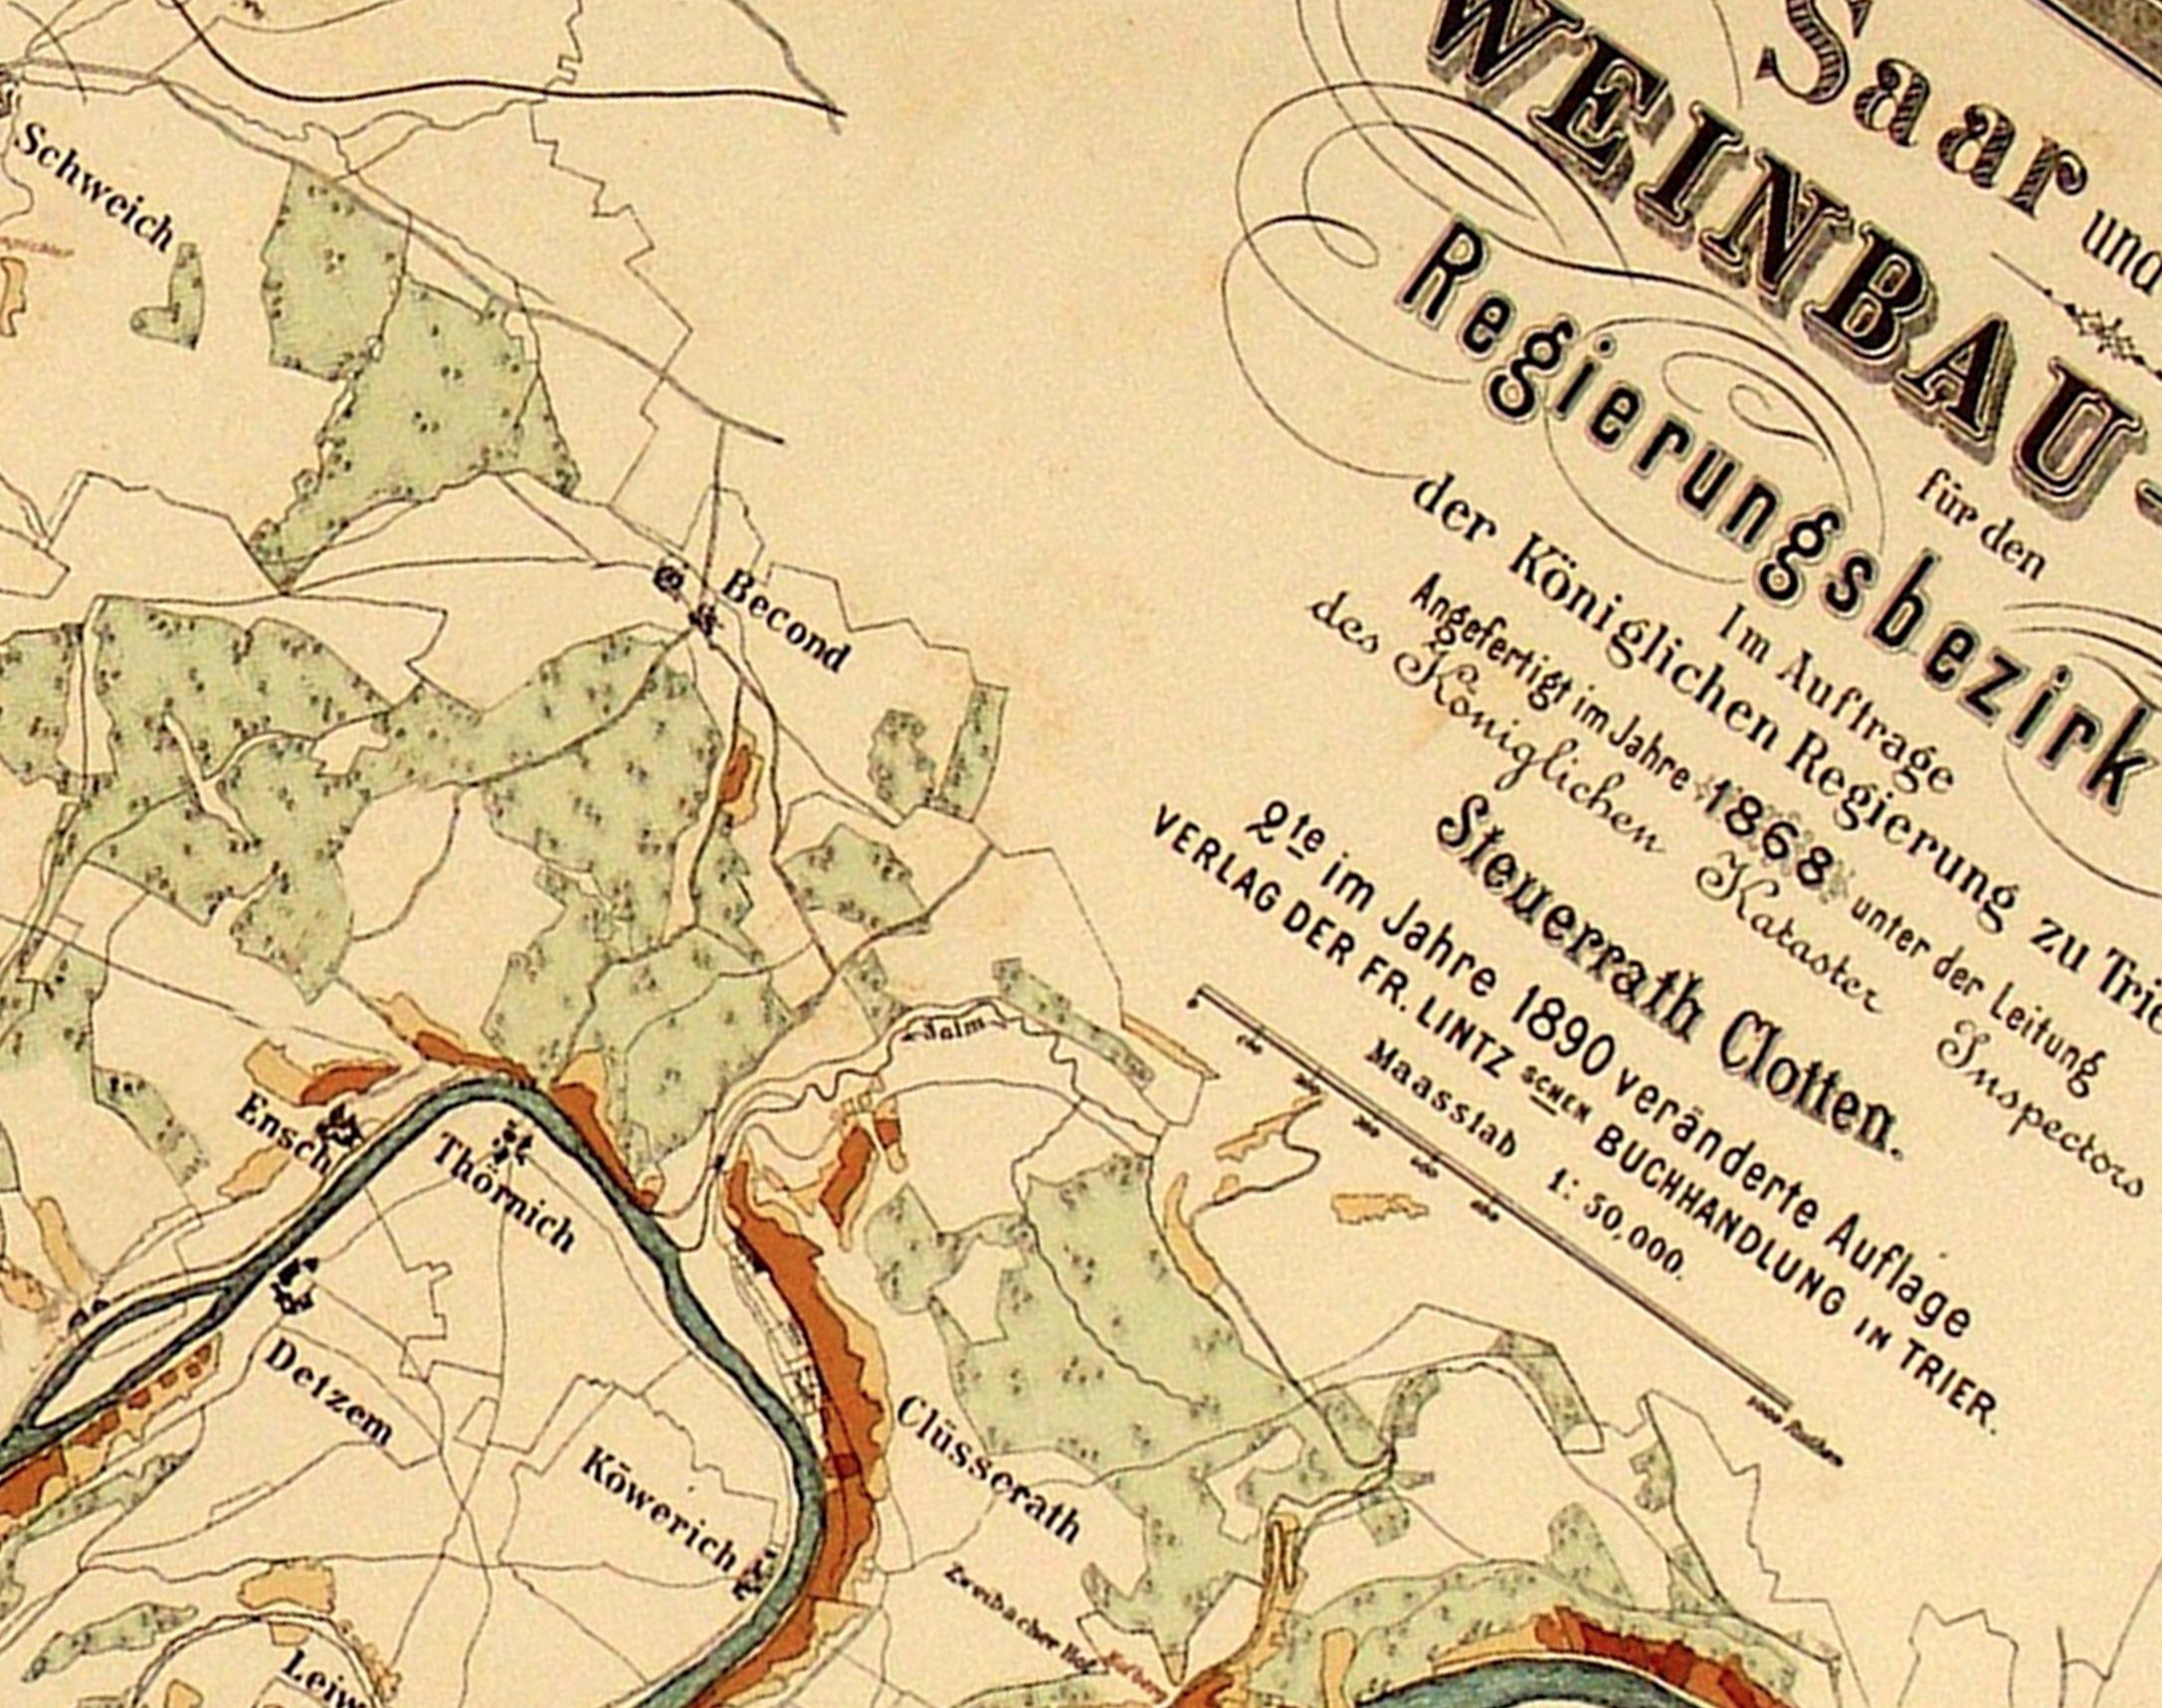 1868 Mosel Map Rieslingfeier